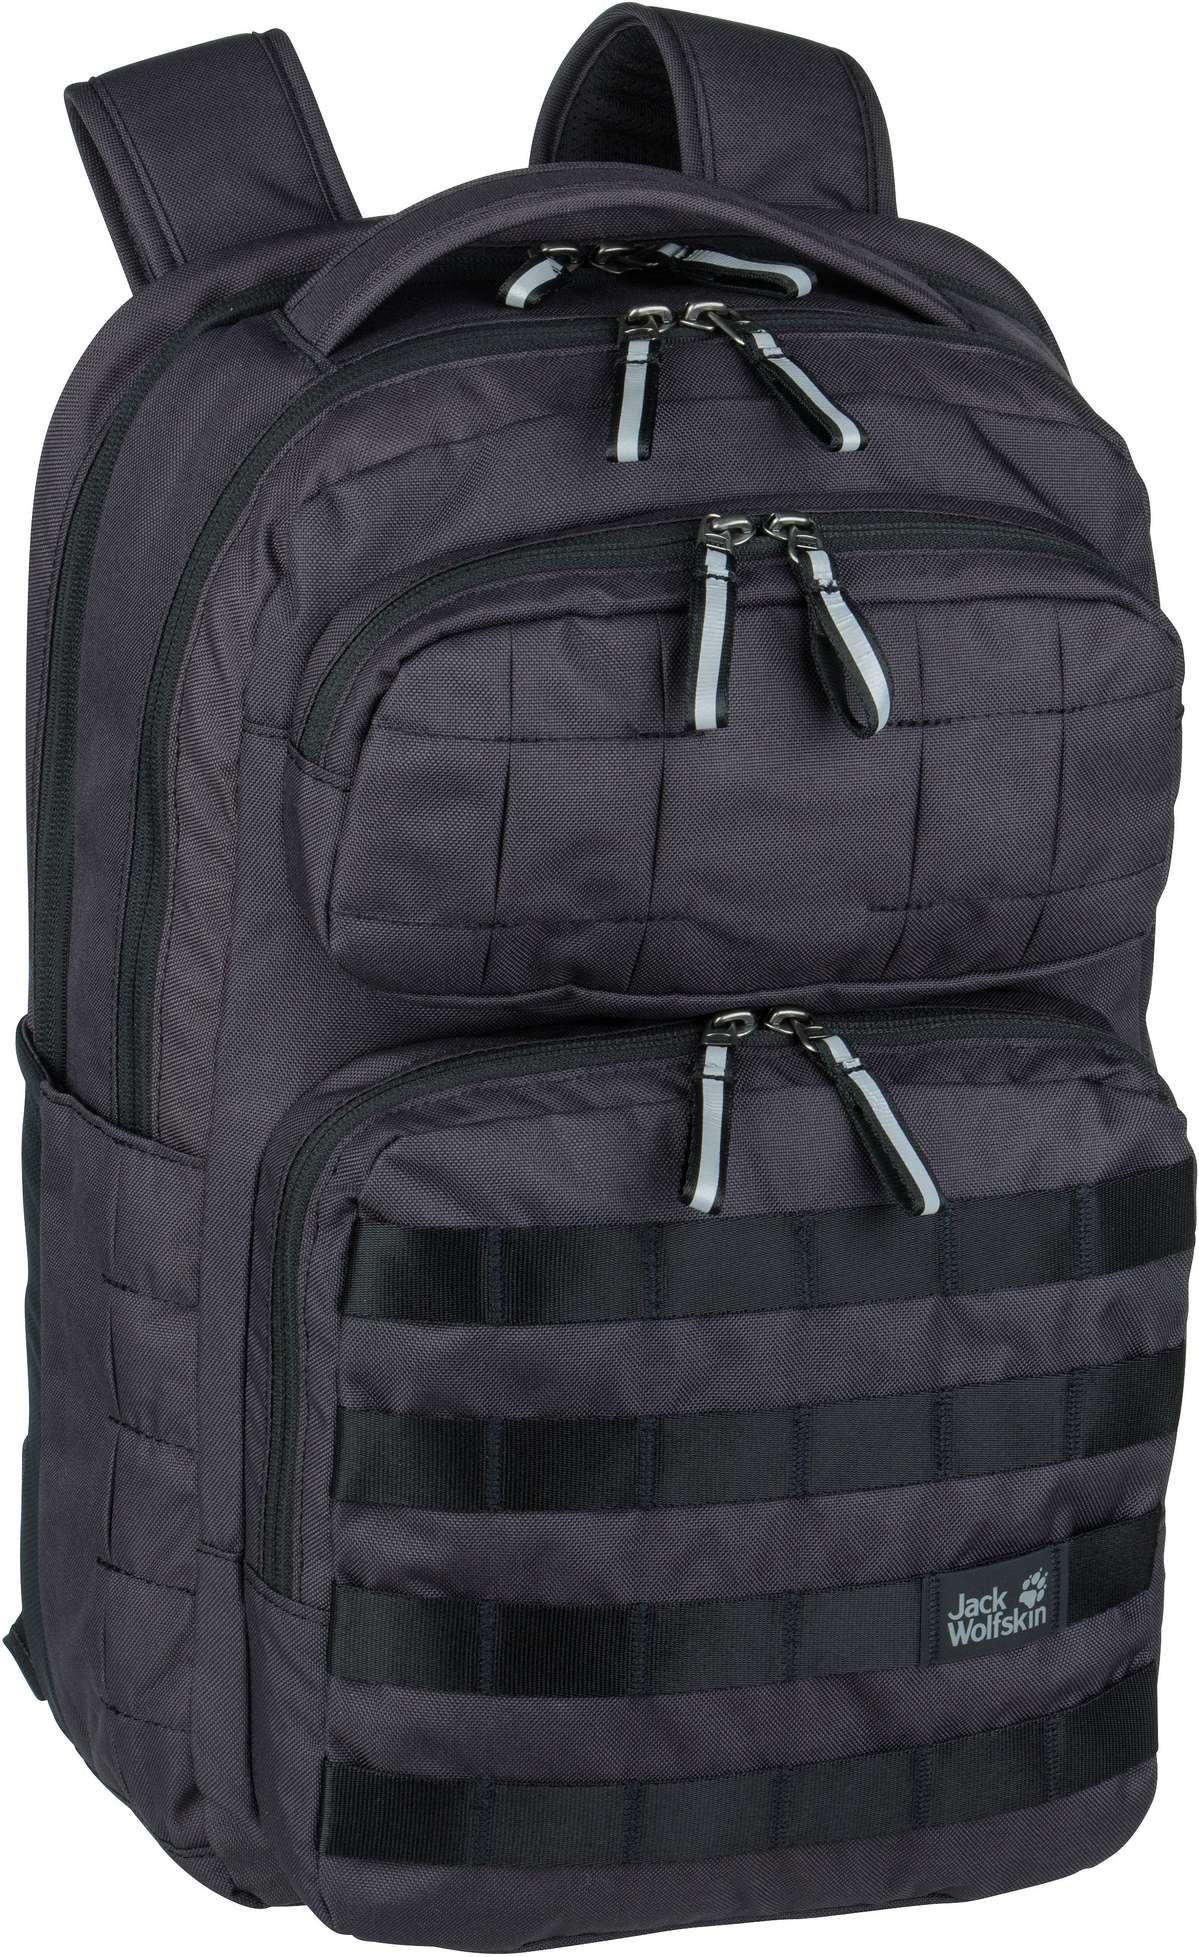 Schulrucksack TRT School Pack Phantom (20 Liter)